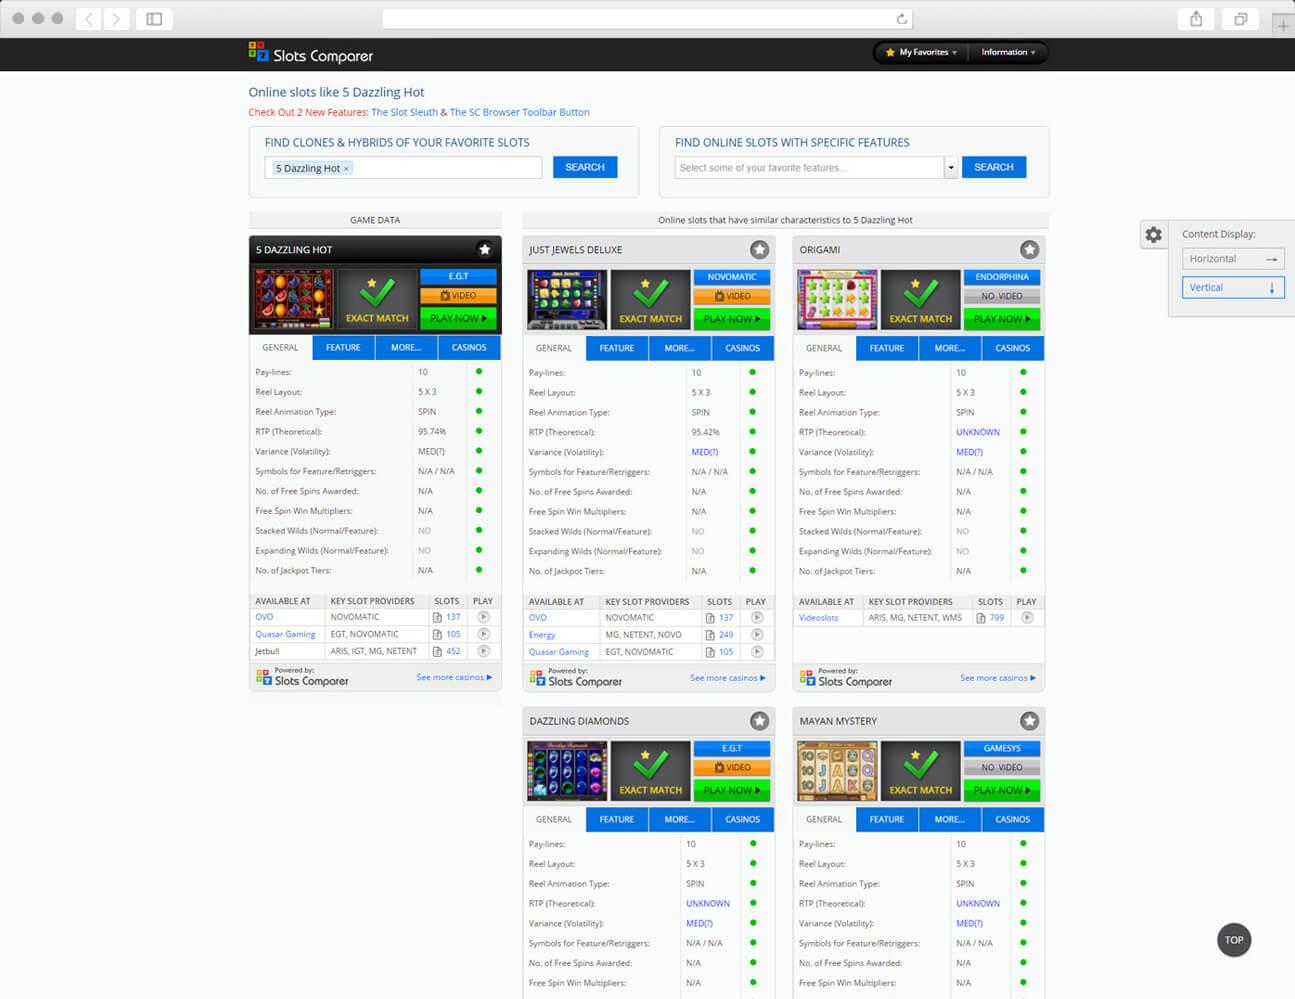 Web Design Case Study - block elements - slotscomparer.com